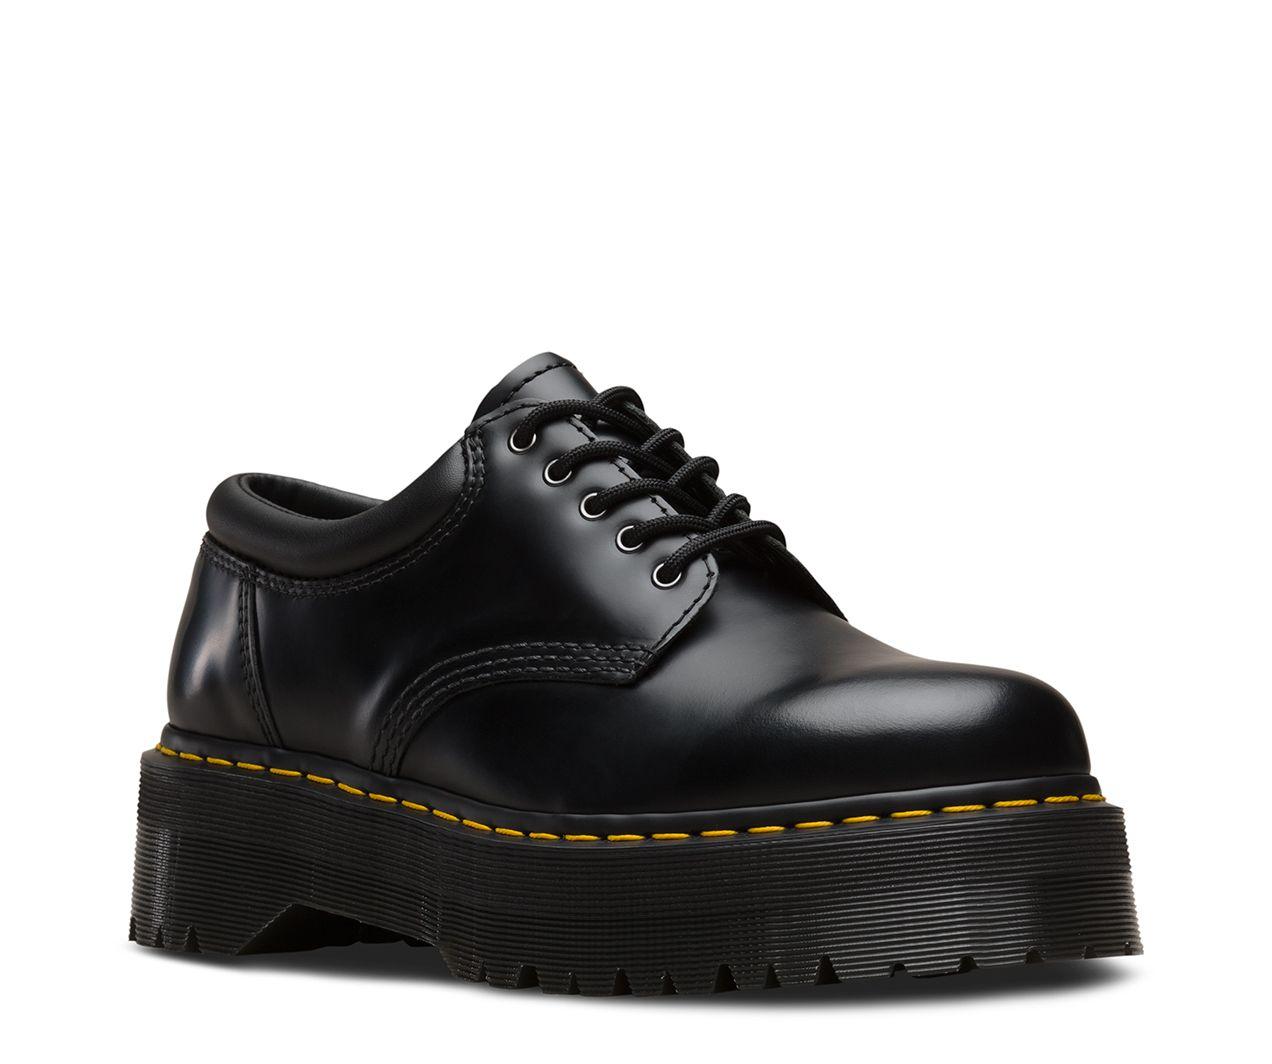 6c0f61d4c9a Dr martens 8053 platform in 2019 | Shoes and bags | Shoes, Shoe ...